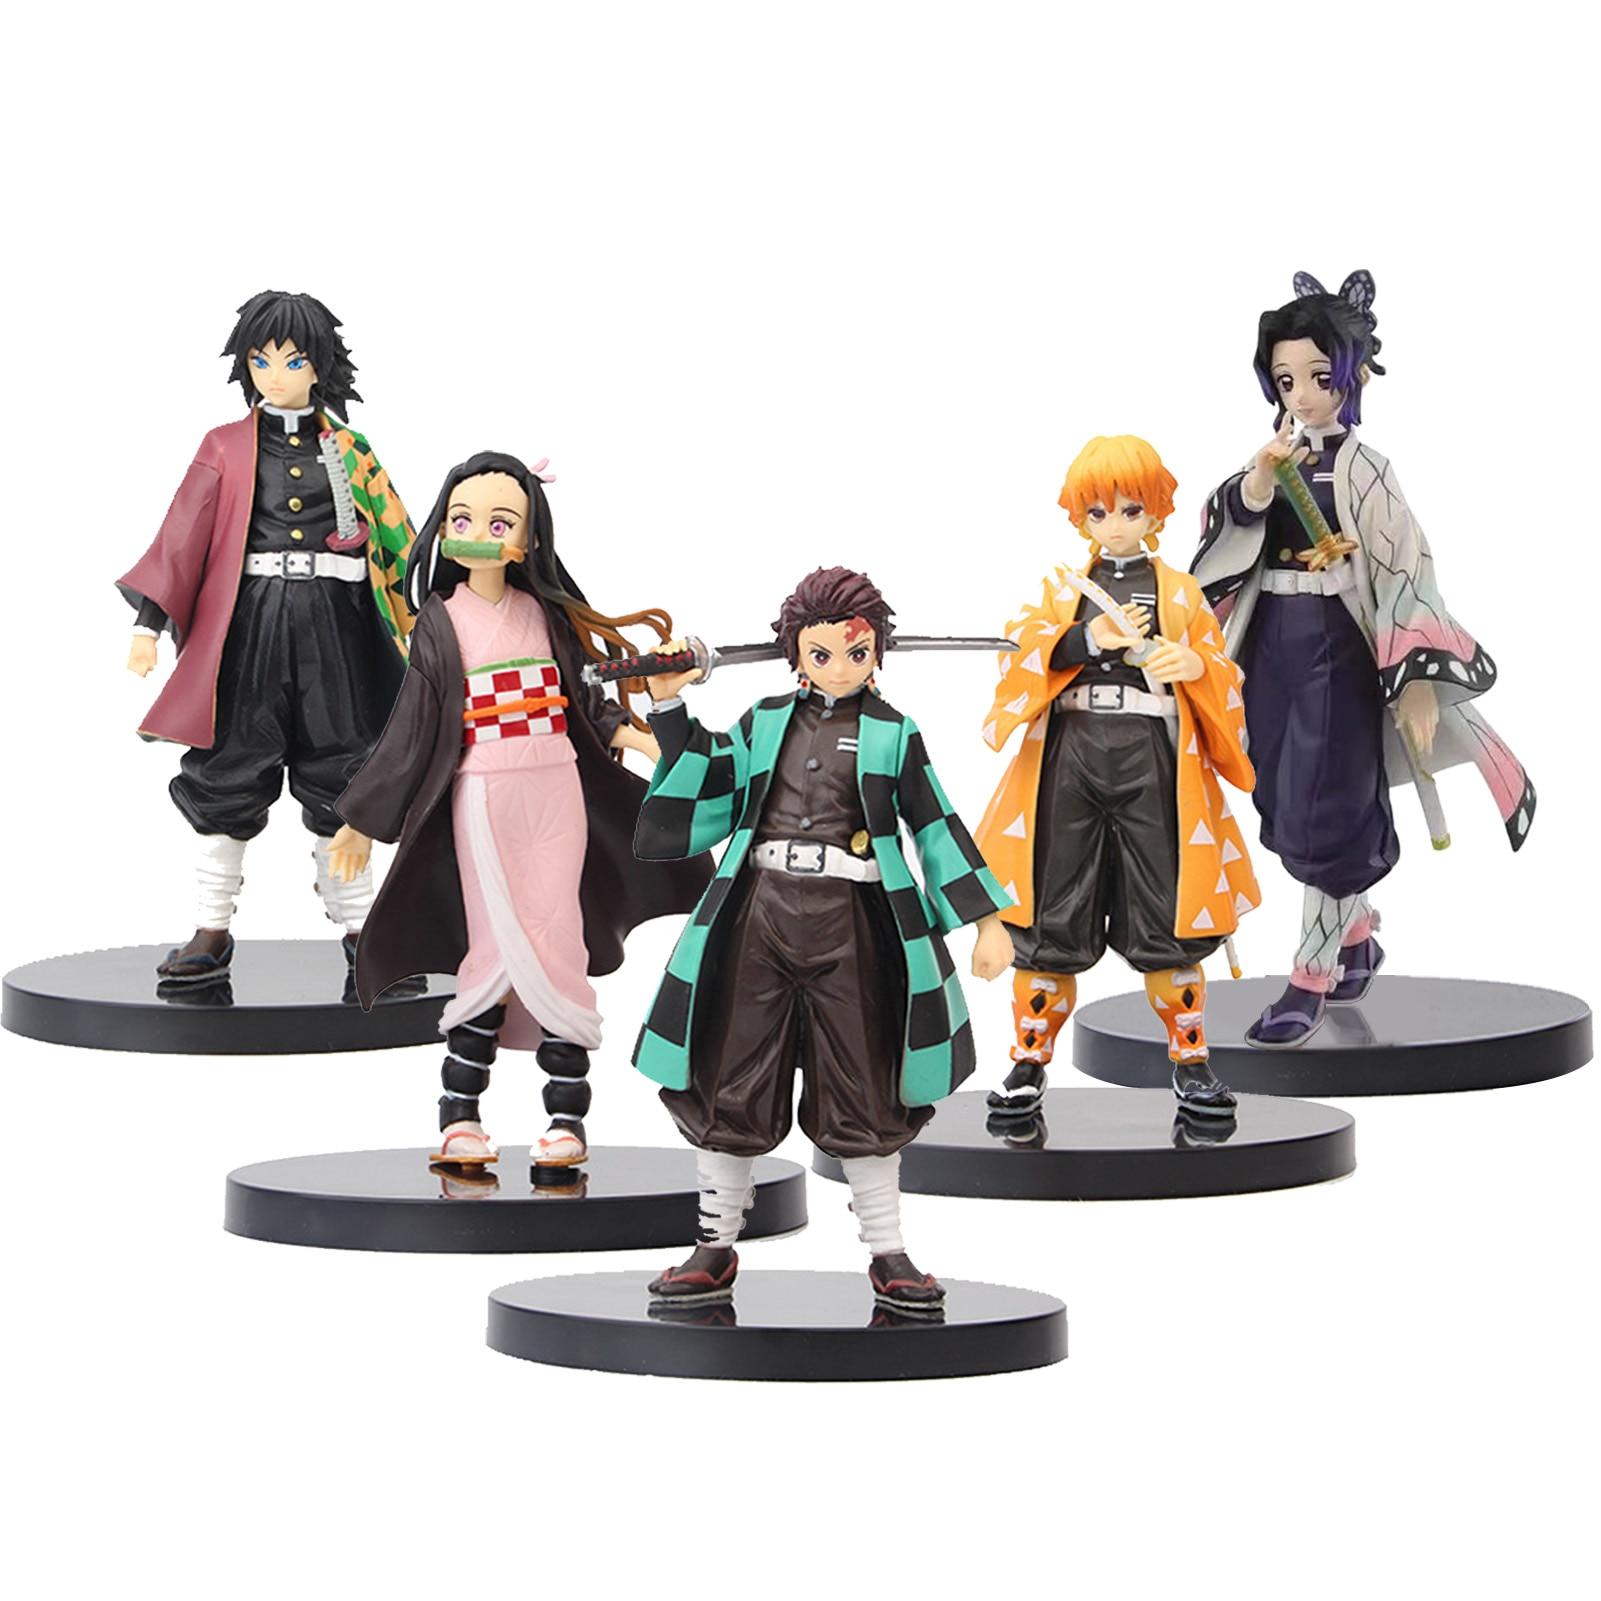 Japanses Anime Demon Slayer PVC Action Figure Toy Kochou Shinobu Tomioka Giyuu Model Figuals Dolls Toys Gifts